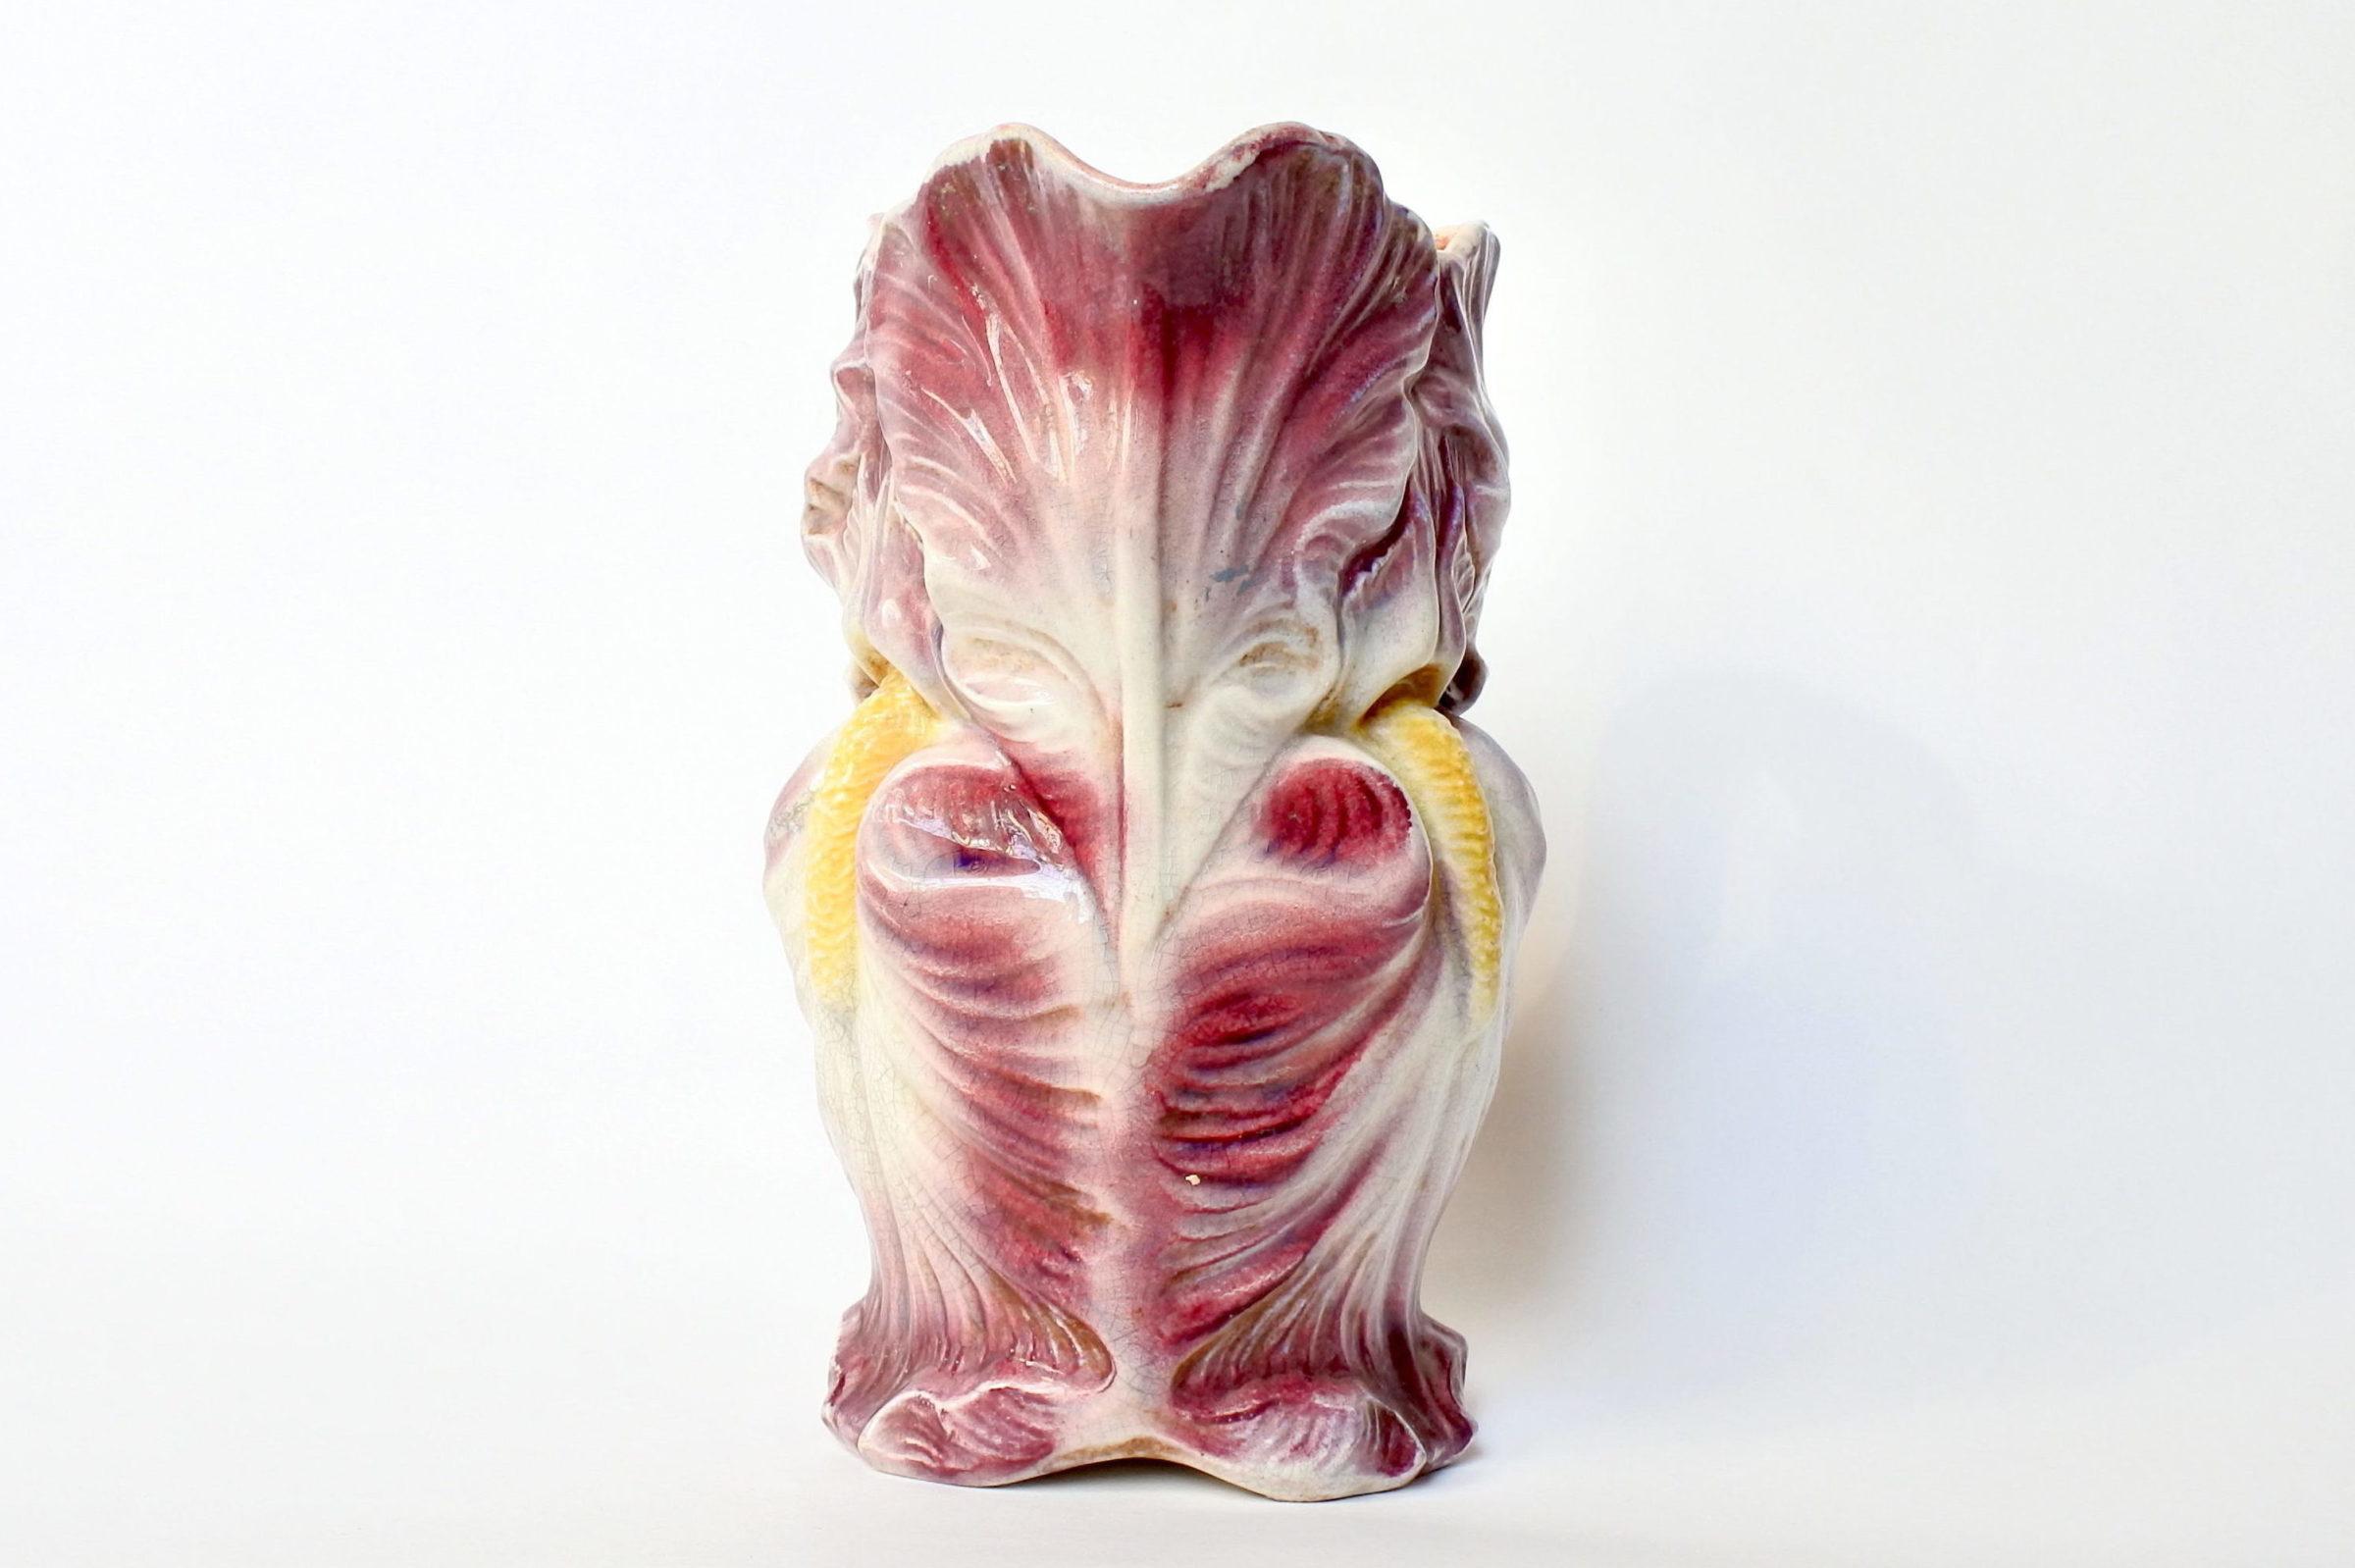 Brocca in ceramica barbotine a forma di iris - Onnaing n° 813 - 5